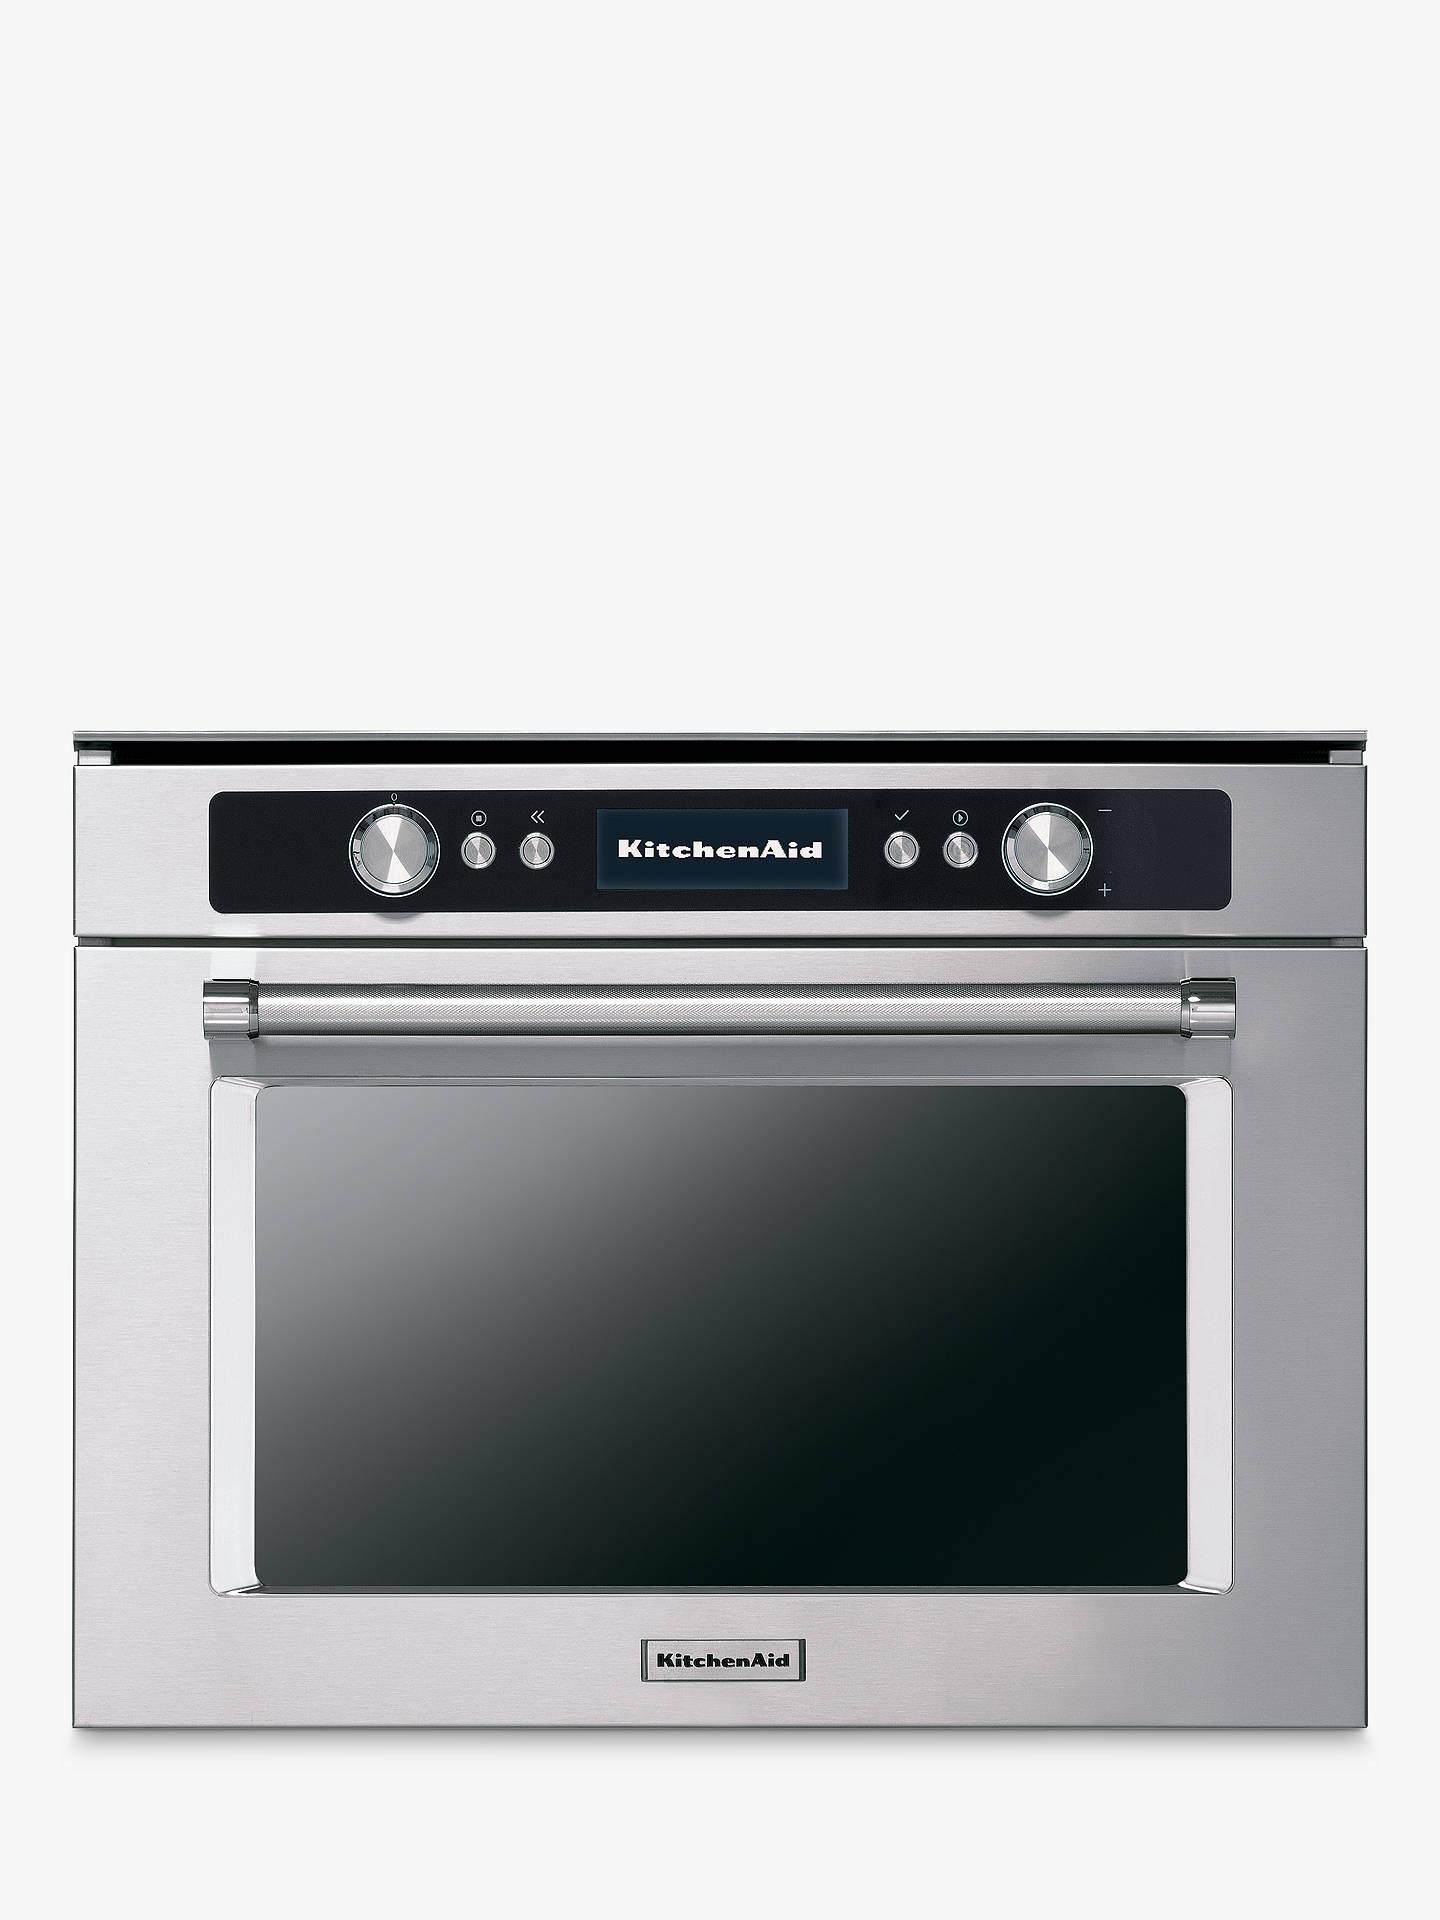 KitchenAid KOCCX45600 Built-In Multifunction Single Oven, Stainless Steel